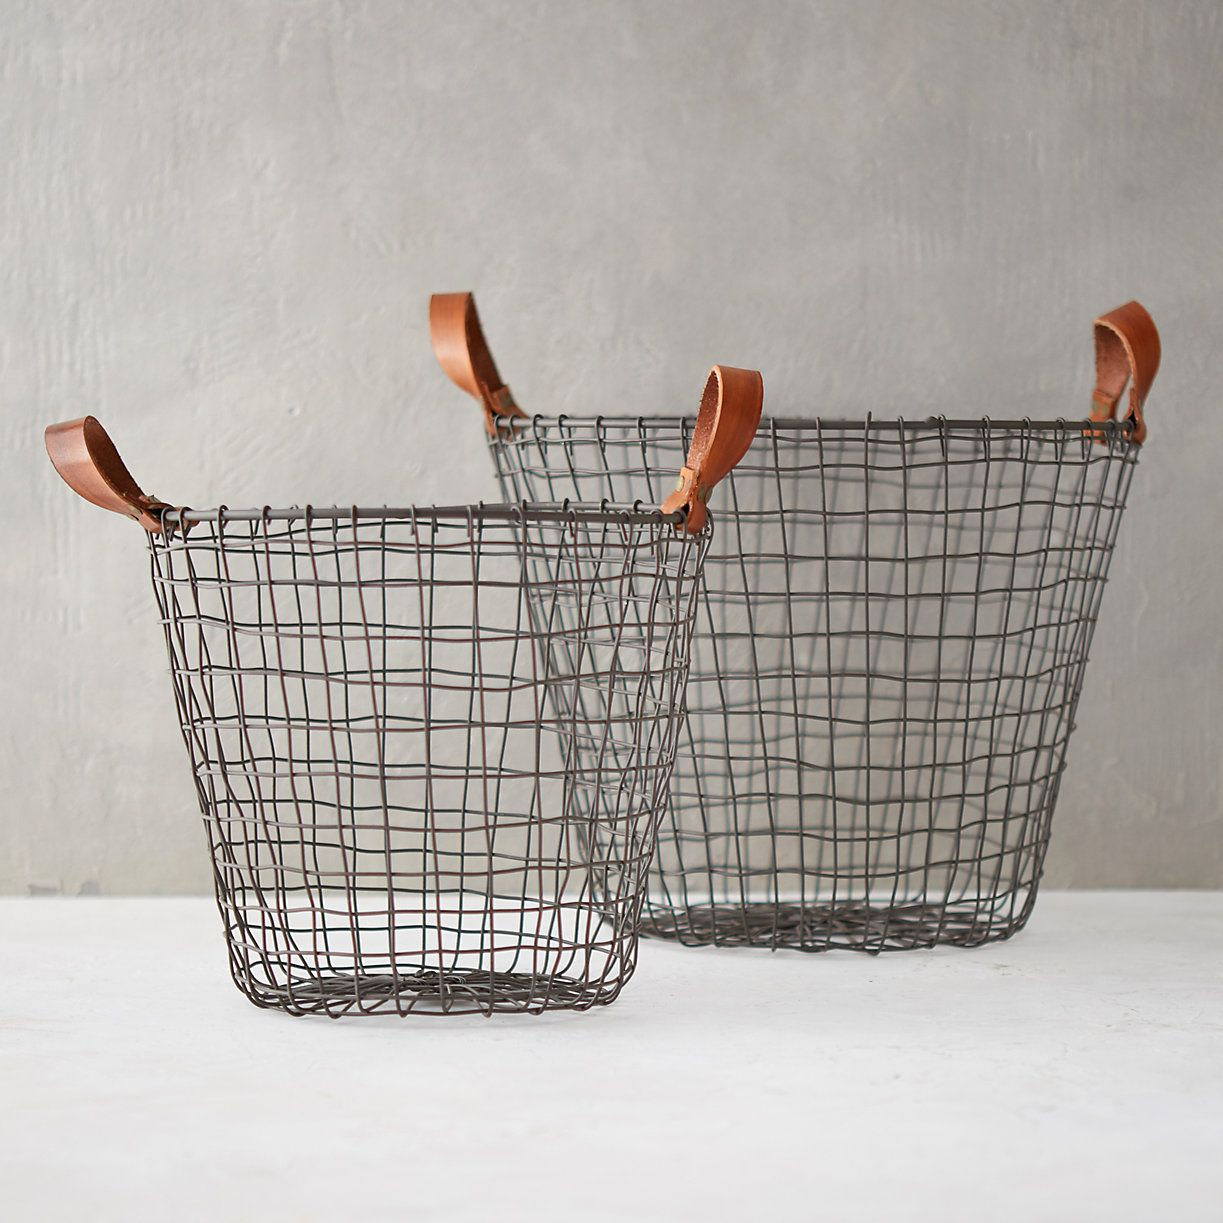 Leather Handle Iron Basket   Pinterest   Wire basket, Iron and Storage